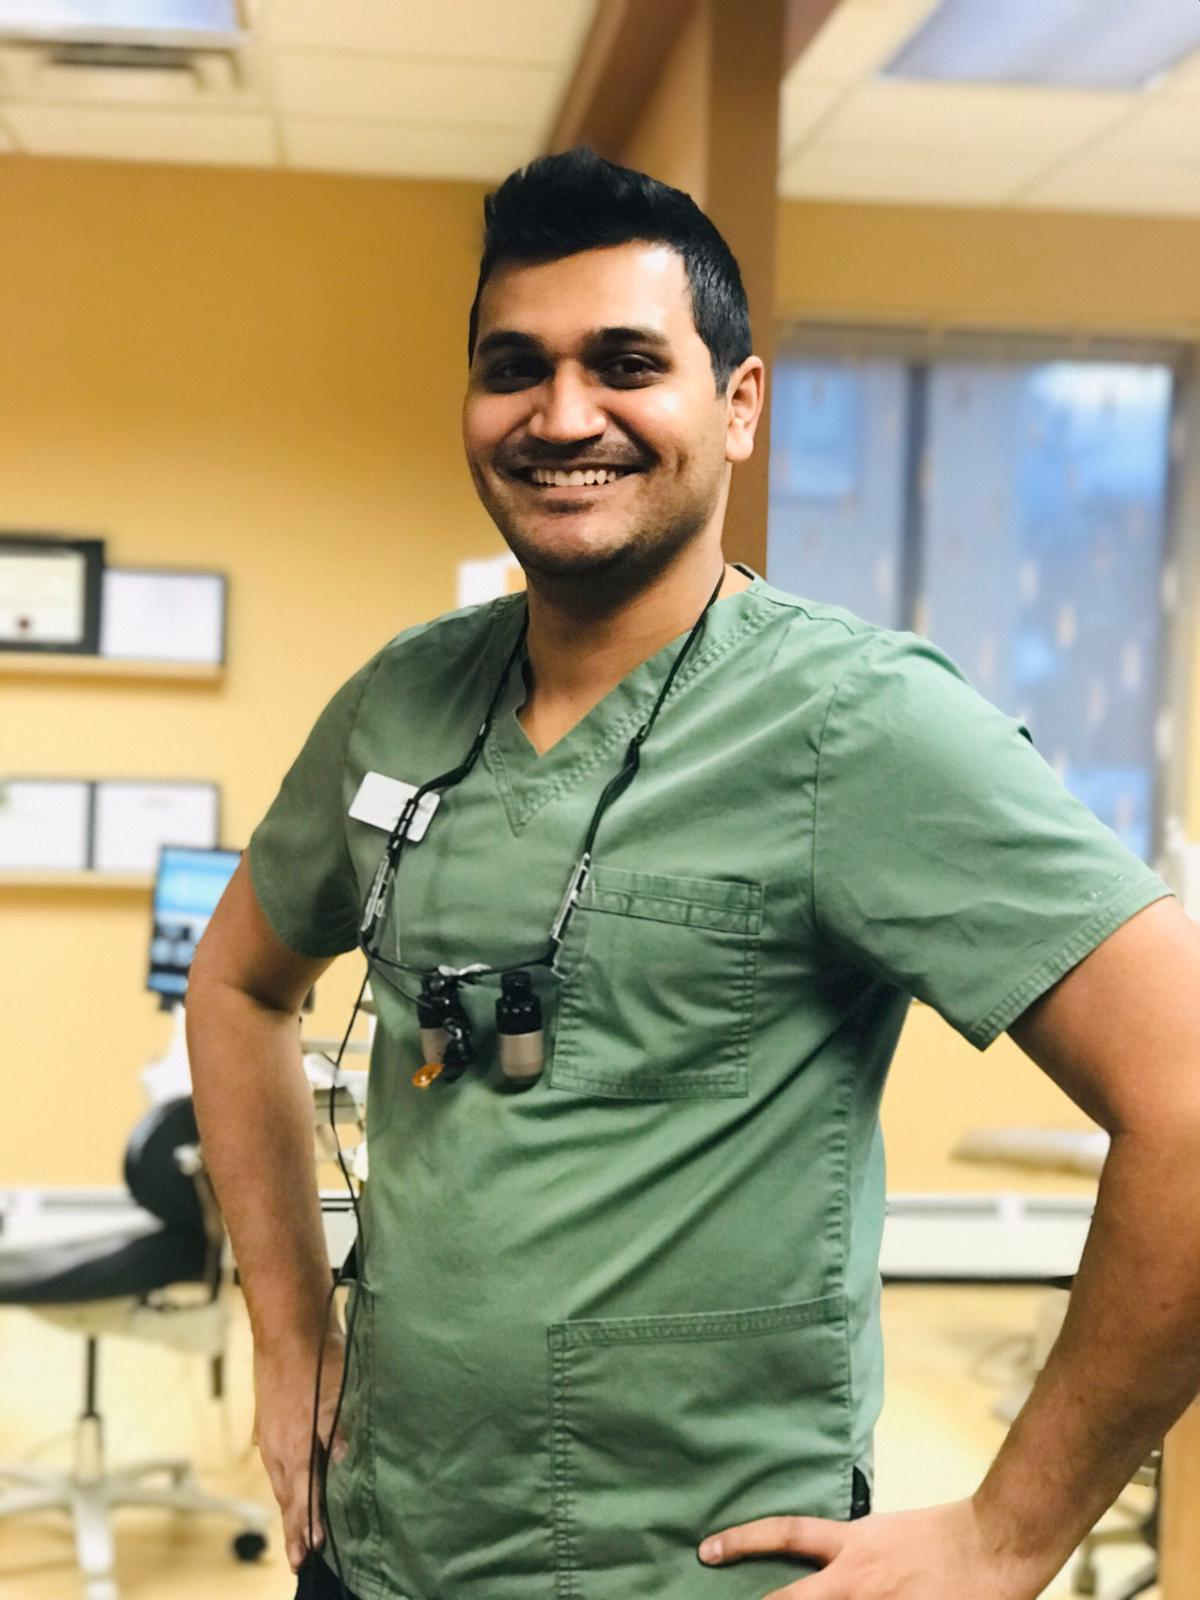 Dr. Sanket Upadhyay